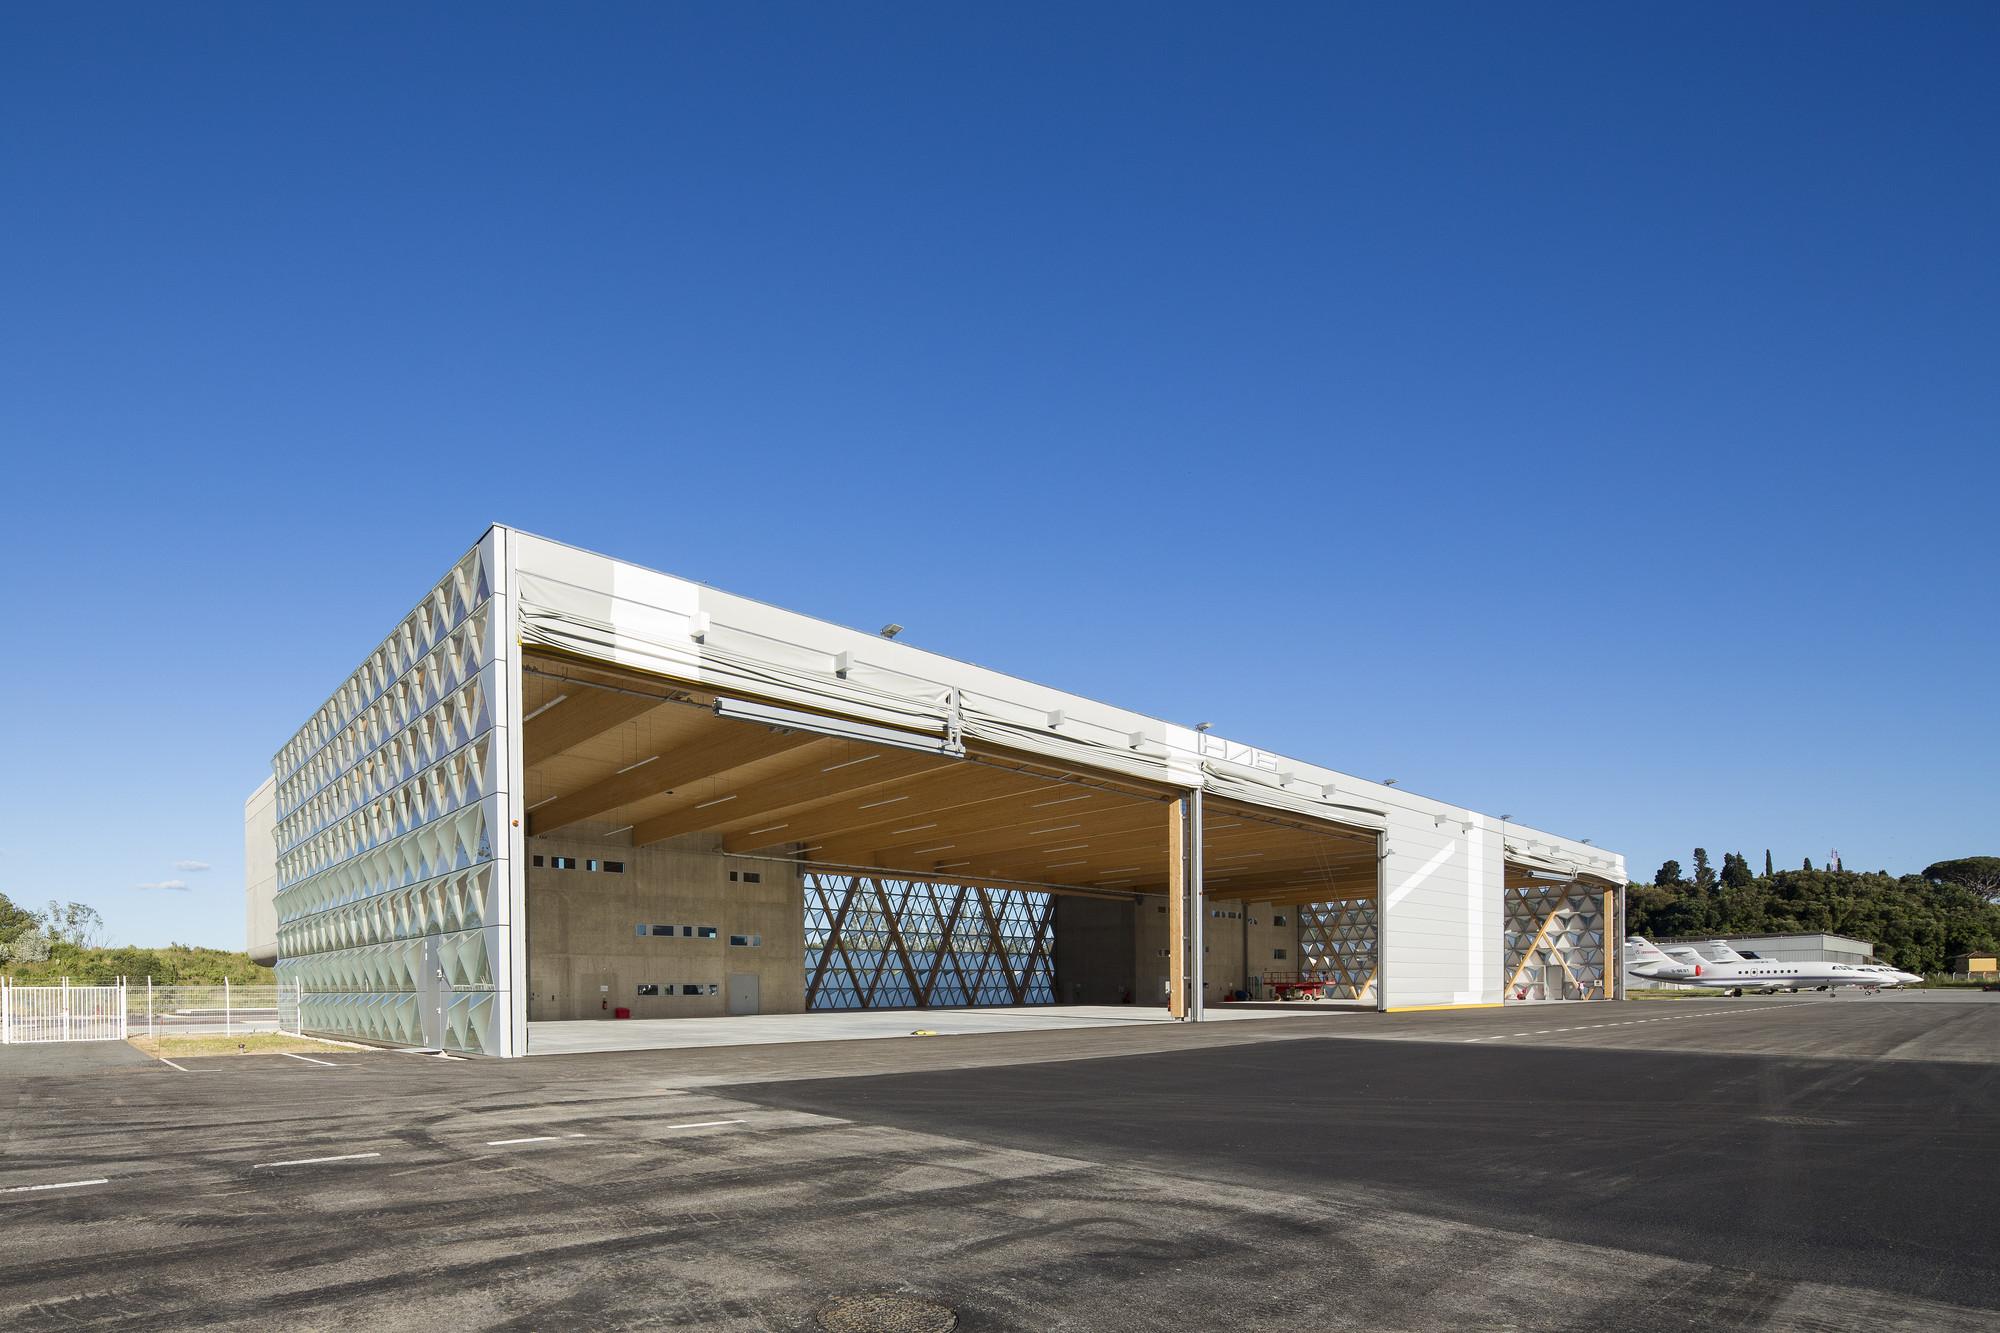 Gallery of hangar h16 comte vollenweider architectes 11 for Architecture hangar